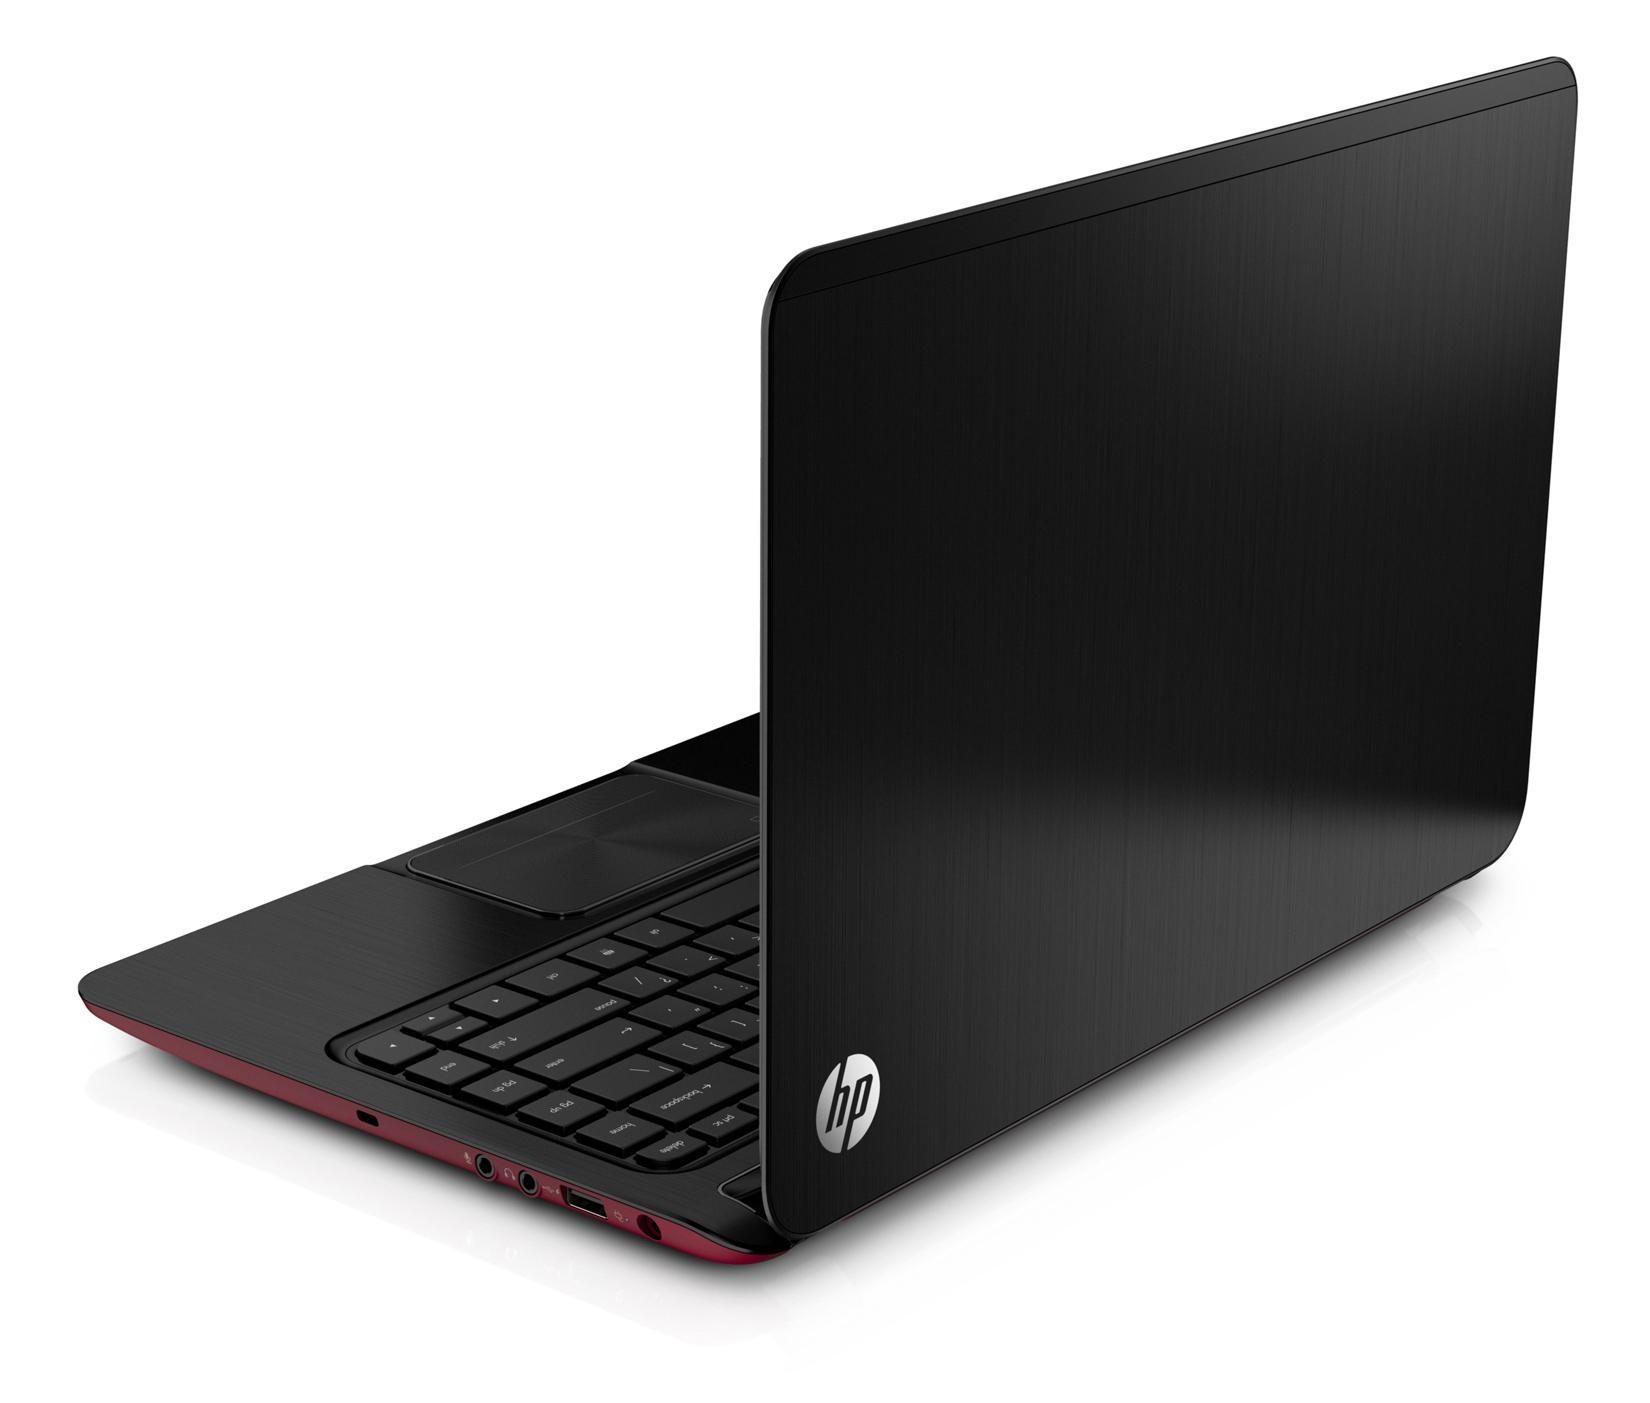 HP-Envy-4-1043cl-14-Refurbished HP Envy 4-1043cl Ultrabook Core i5 14-inch 500 GB HDD 4 GB RAM Win 10 Pro-image